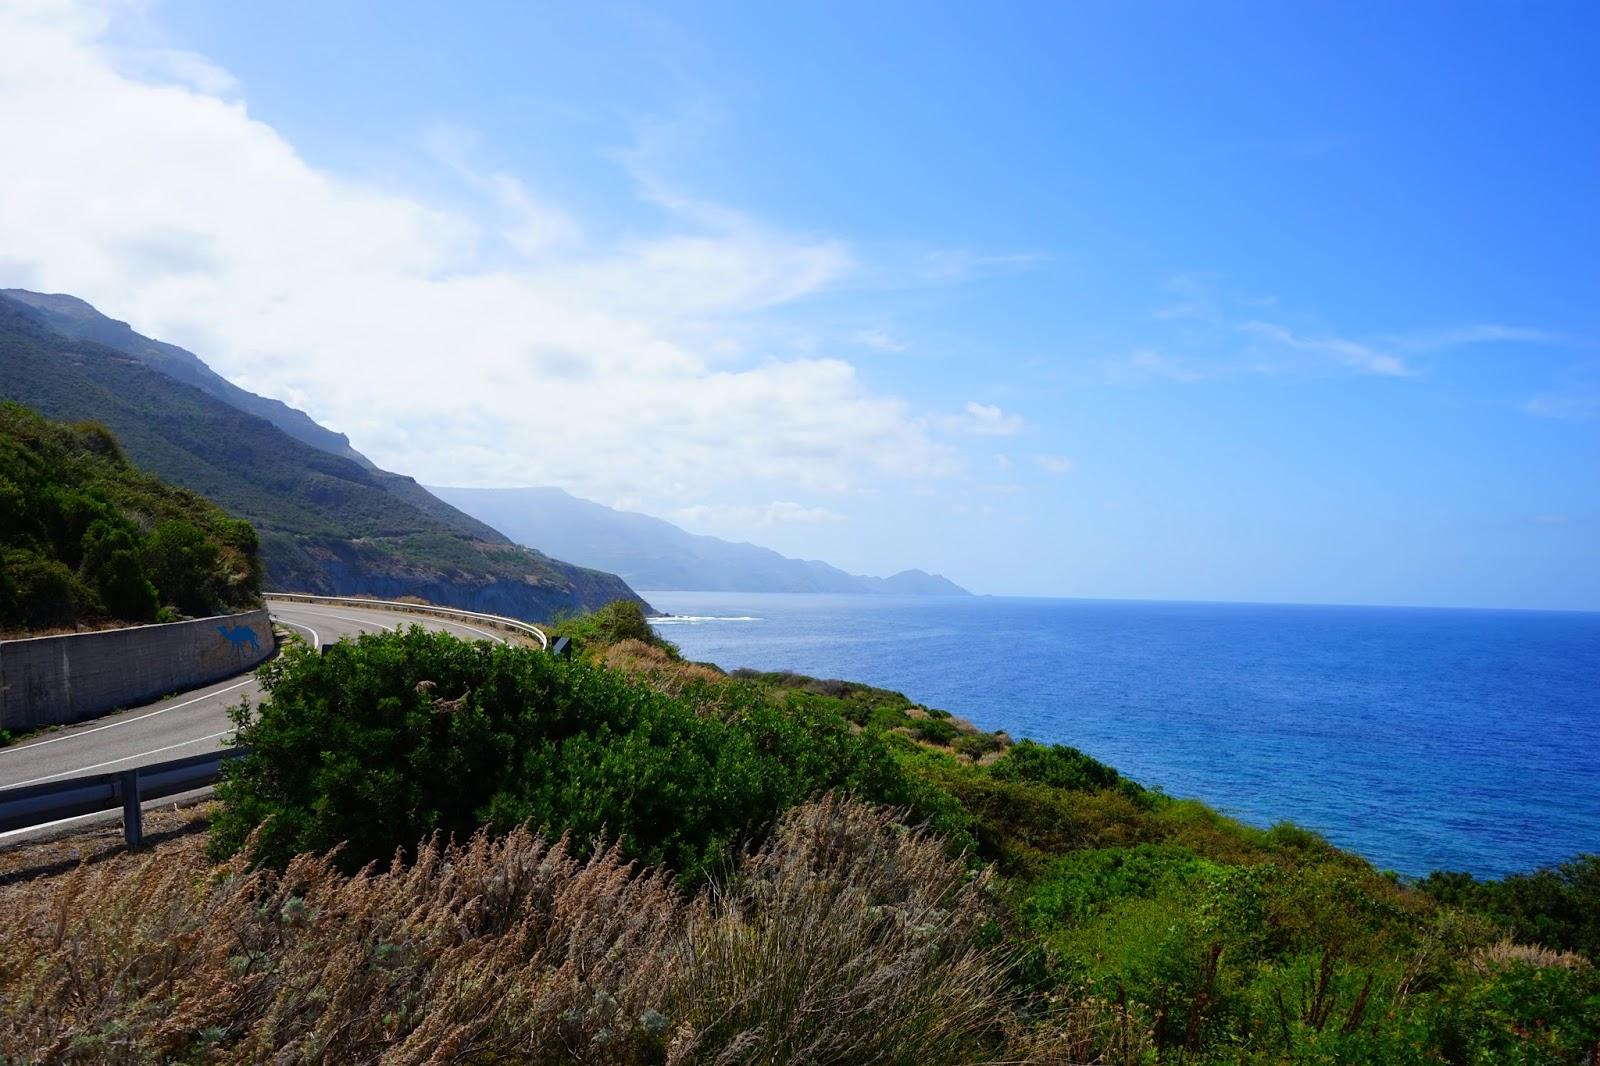 Le Chameau Bleu - Blog Voyage  Sardaigne - Route de sardaigne vers Bosa -Sardinia